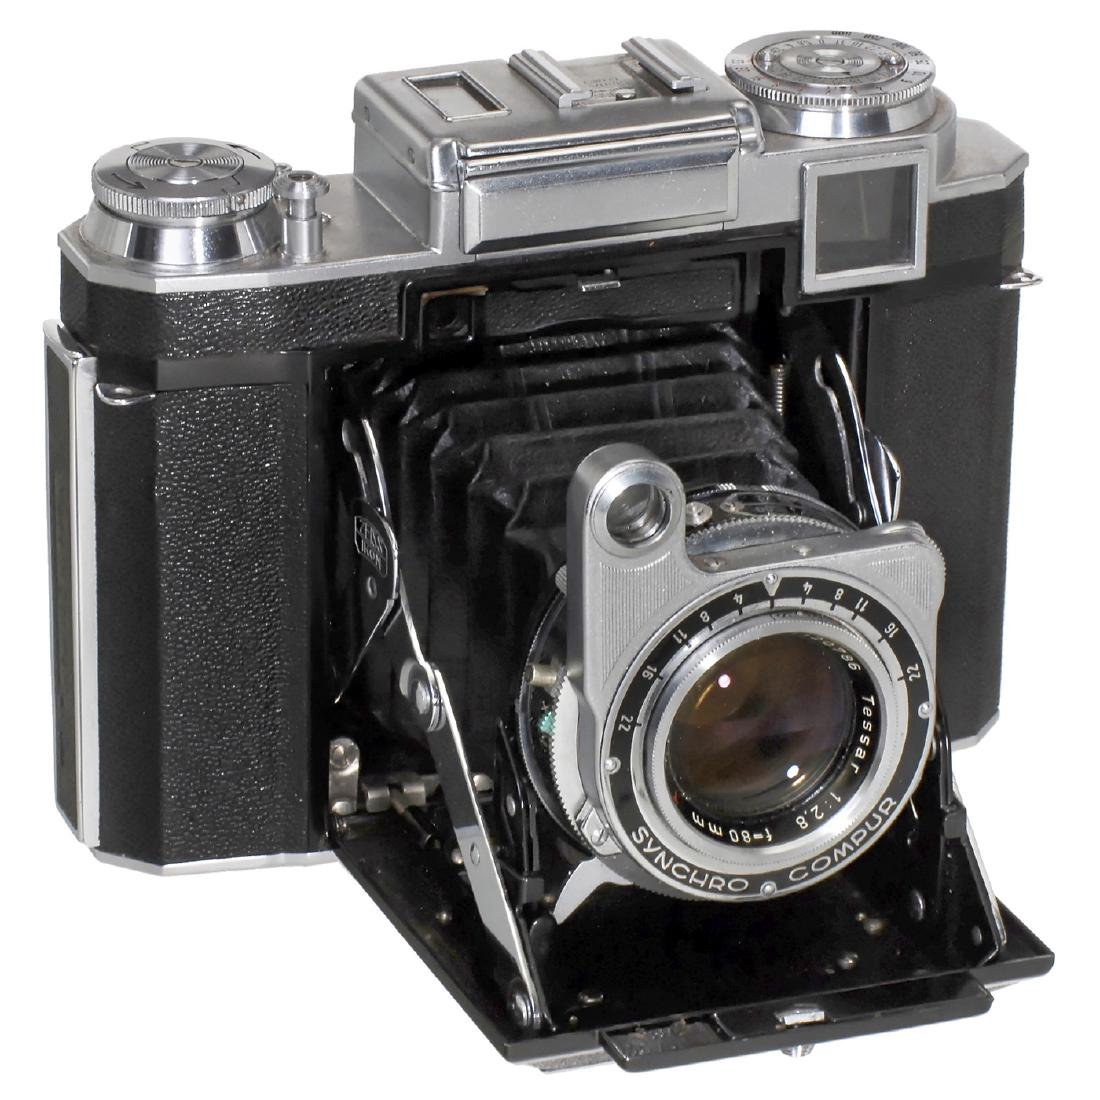 Super Ikonta 533/16 (Opton-Tessar), c. 1952